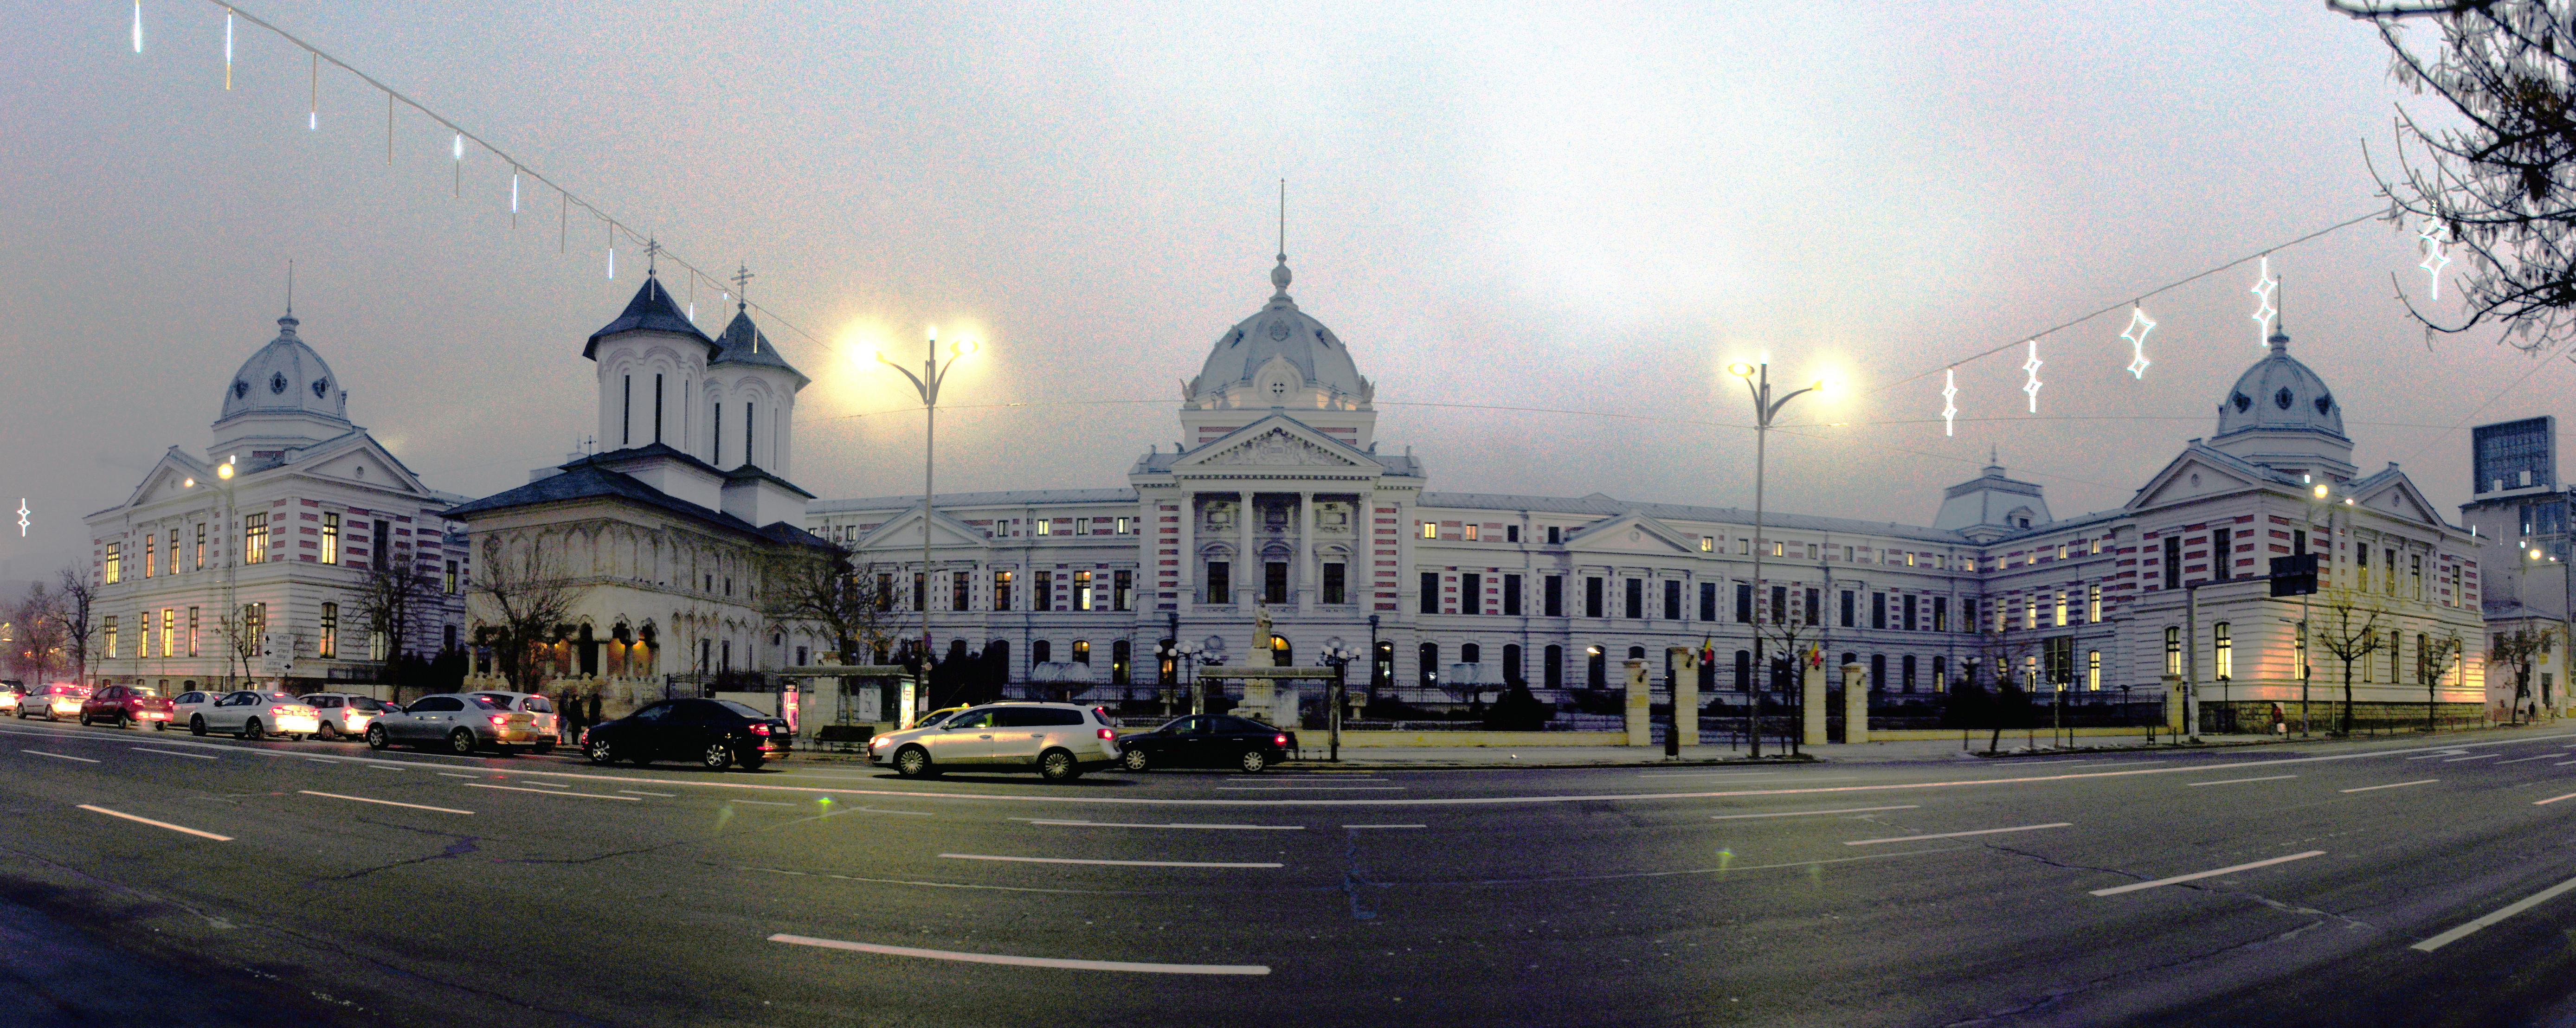 Bucharest_-_Spitalul_Clinic_Coltea_-_pano_01-equalized